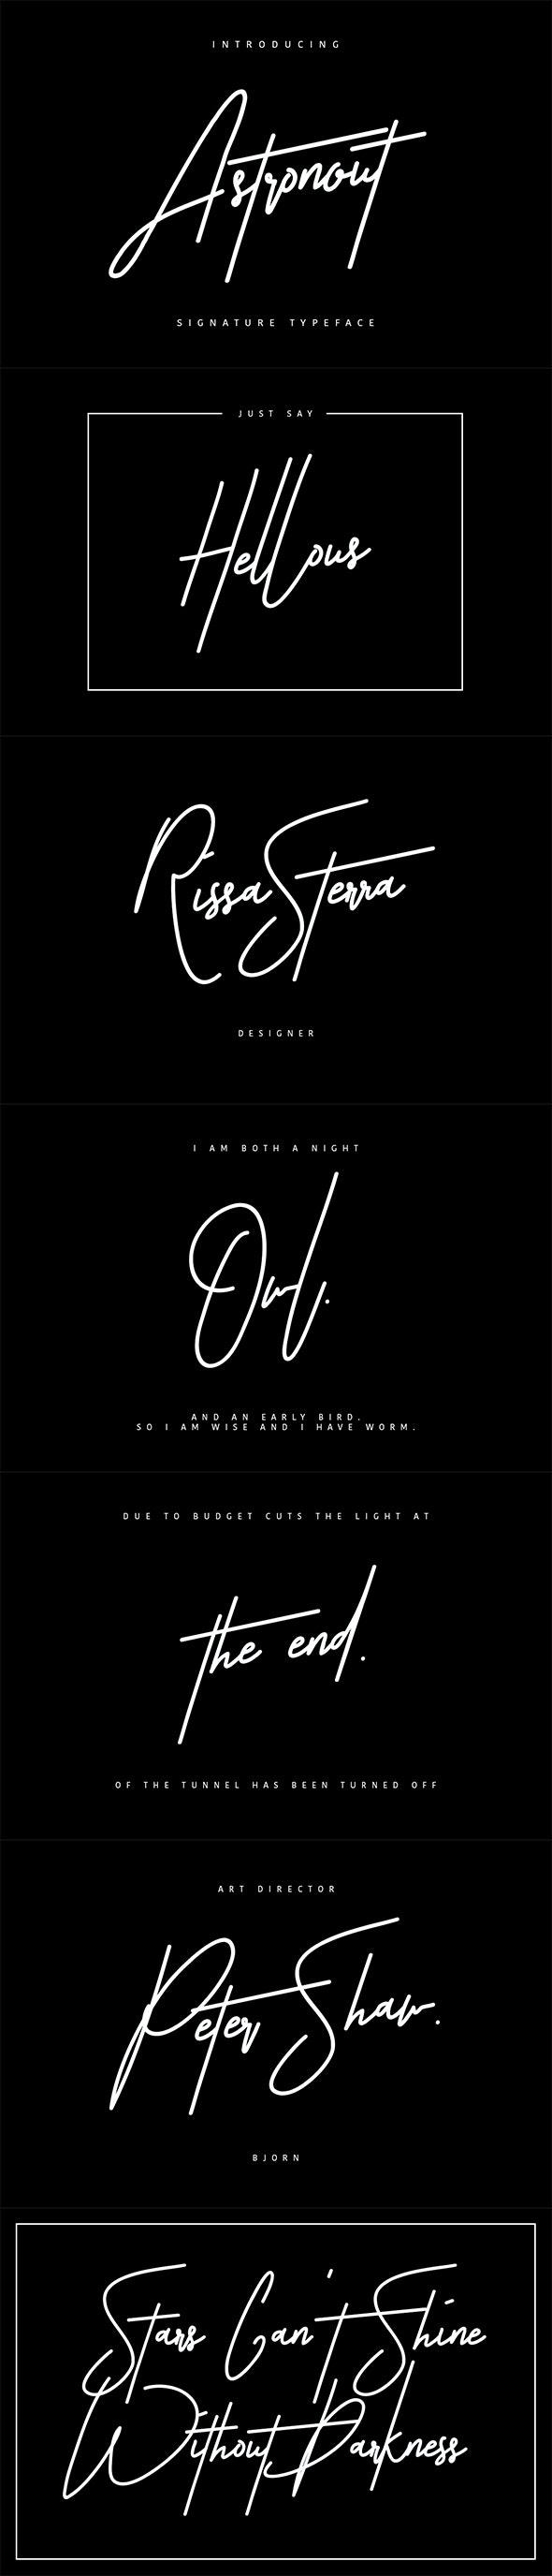 Astronout Signature Typeface - Calligraphy Script